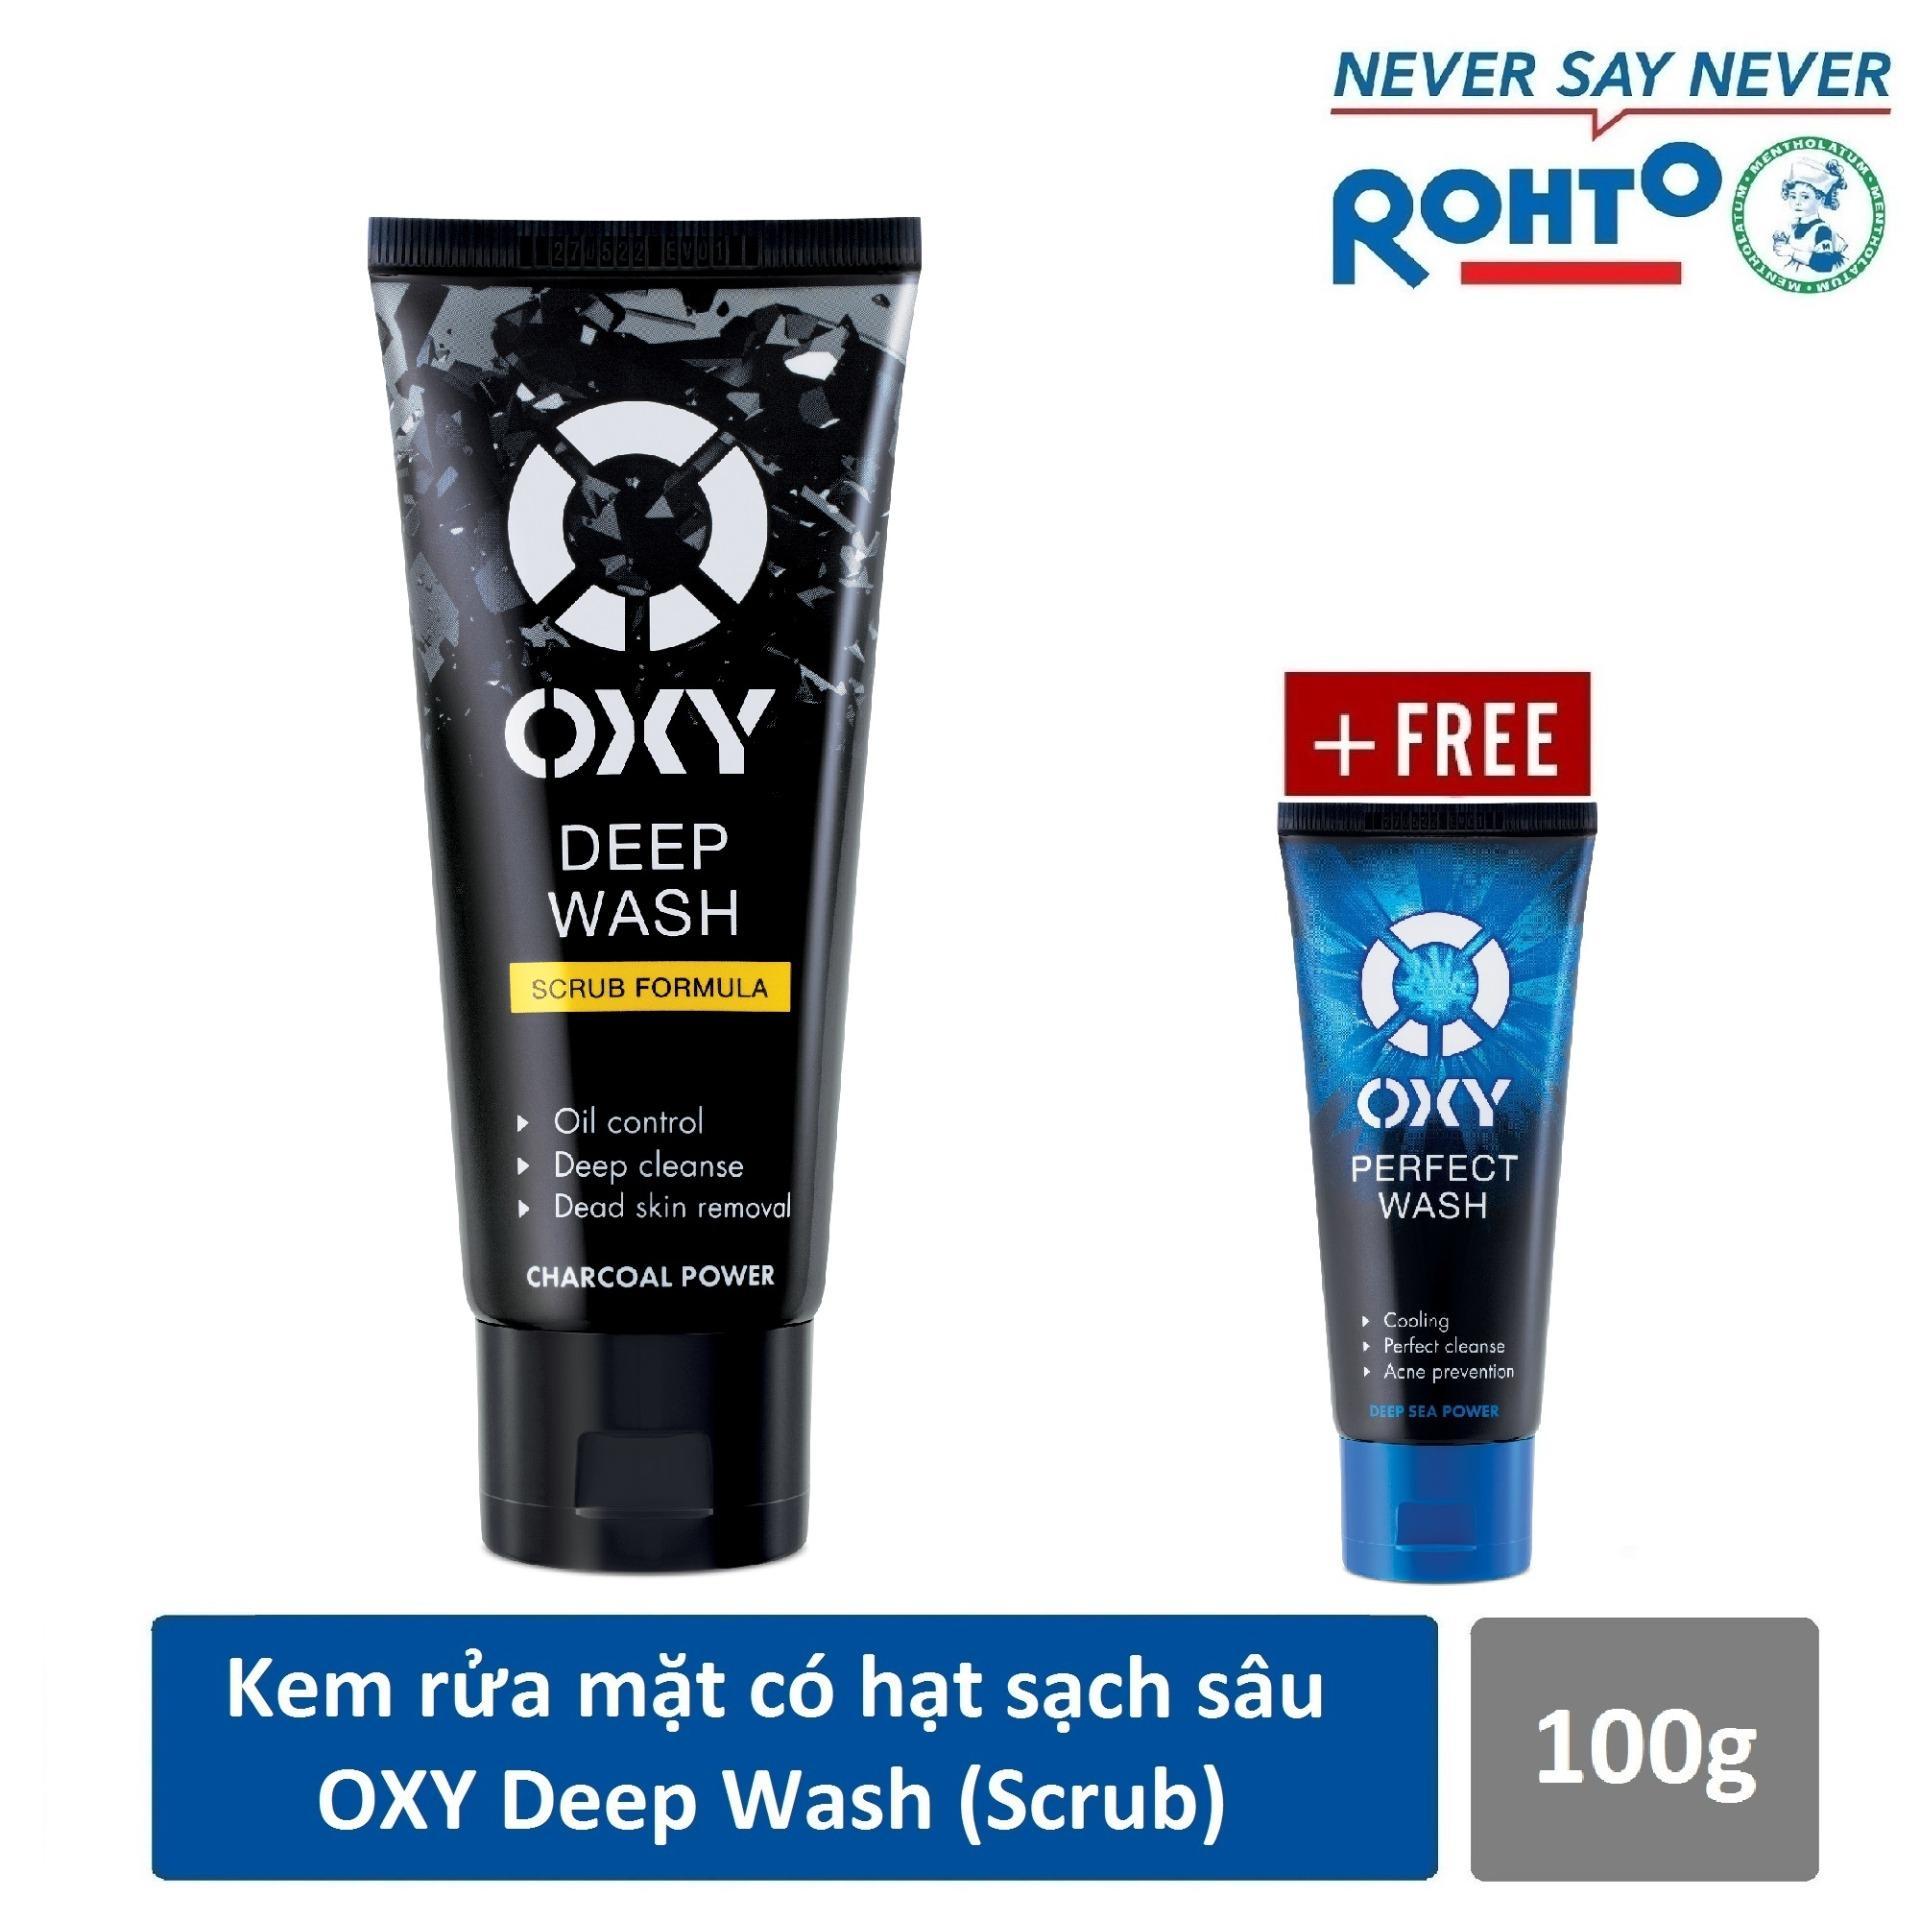 Kem rửa mặt có hạt sạch sâu OXY Deep Wash (Scrub) 100g + Tặng Kem rửa mặt mát lạnh OXY Perfect Wash 25g tốt nhất